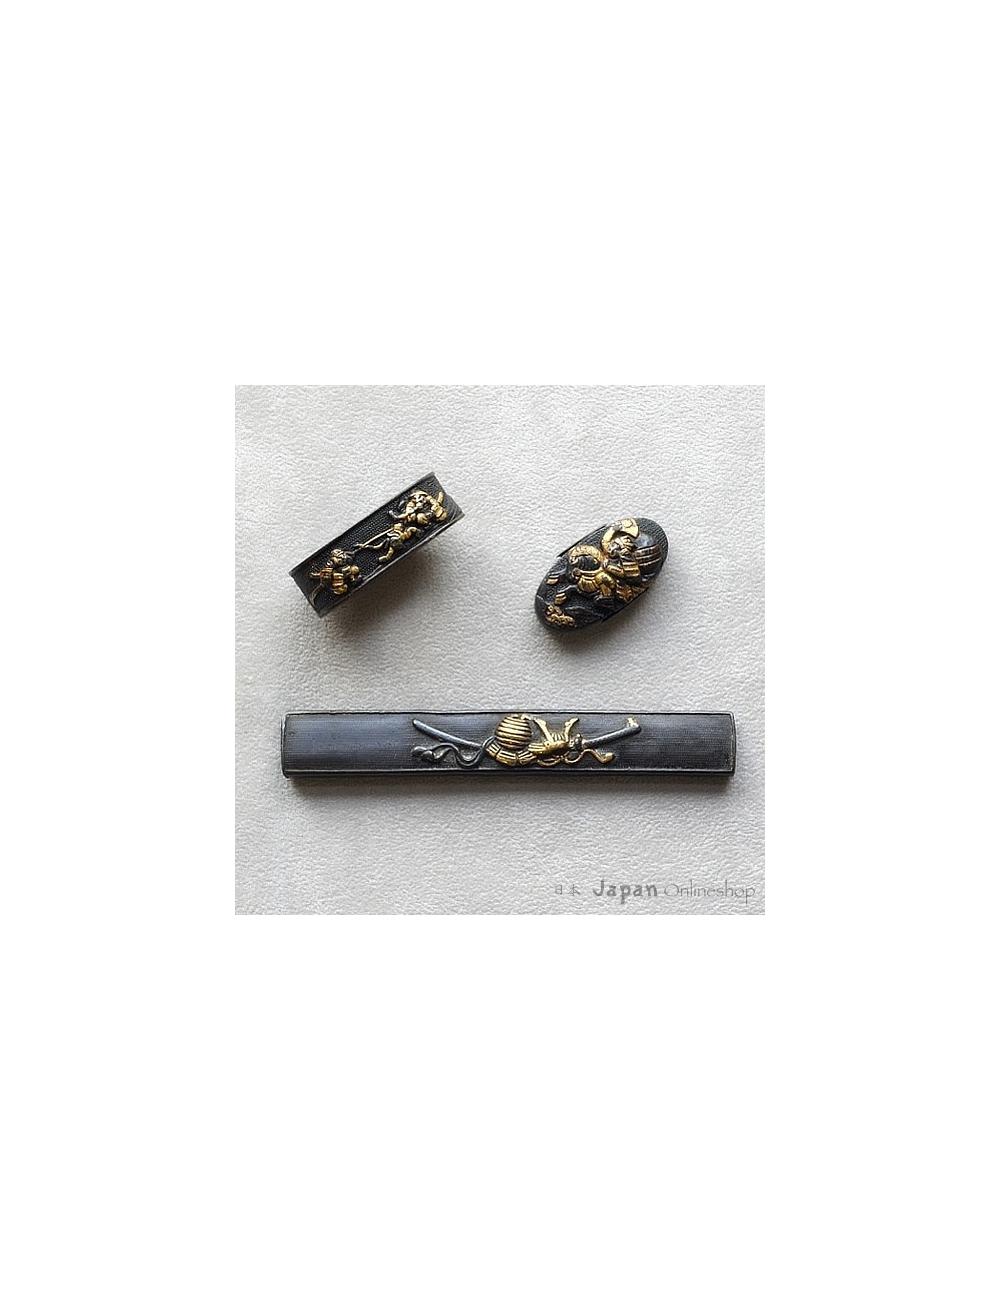 Kodogu-Set, Samurai-Motive